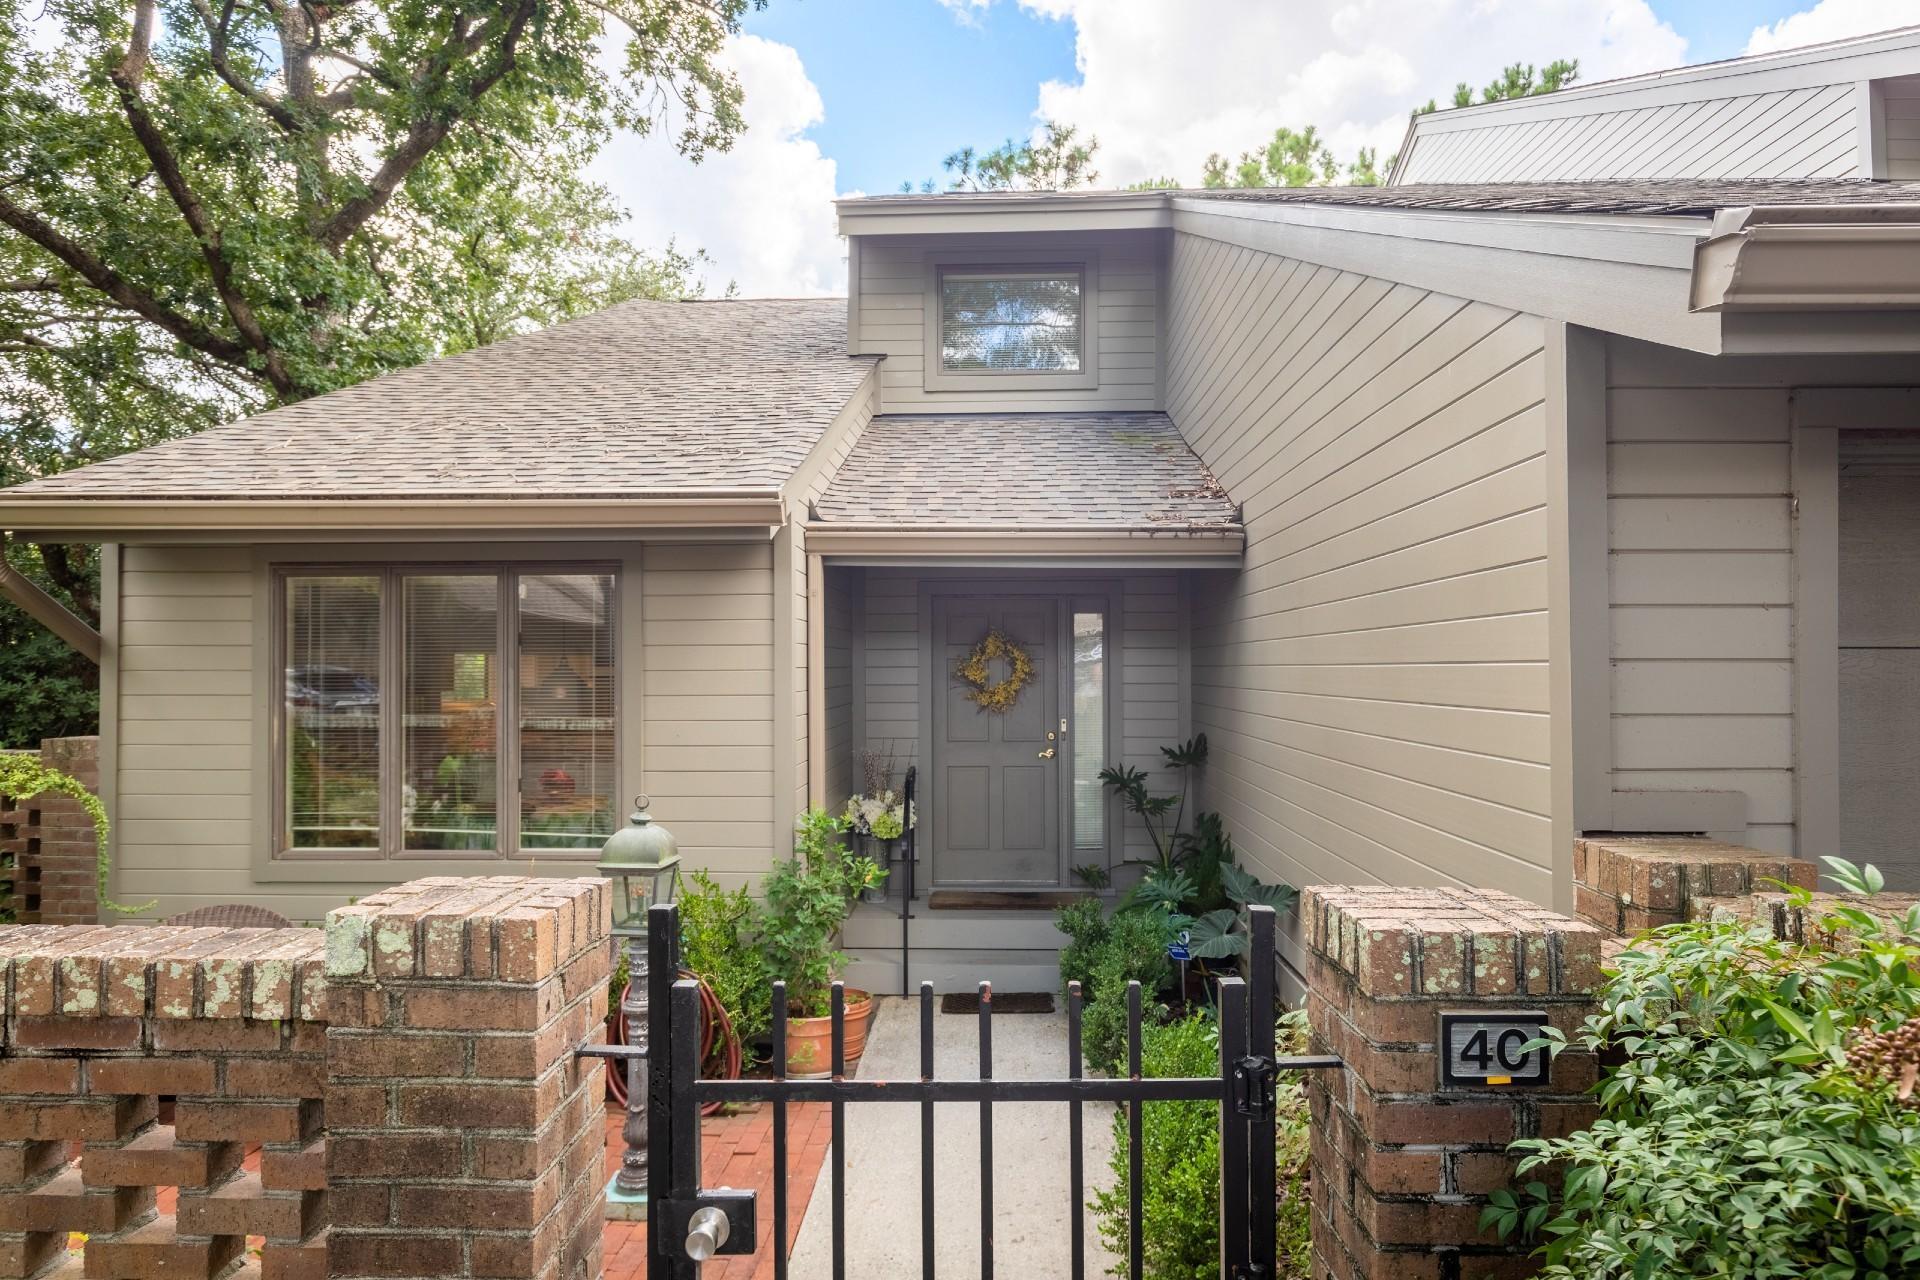 Wappoo Creek Place Homes For Sale - 40 Wappoo Creek, Charleston, SC - 11